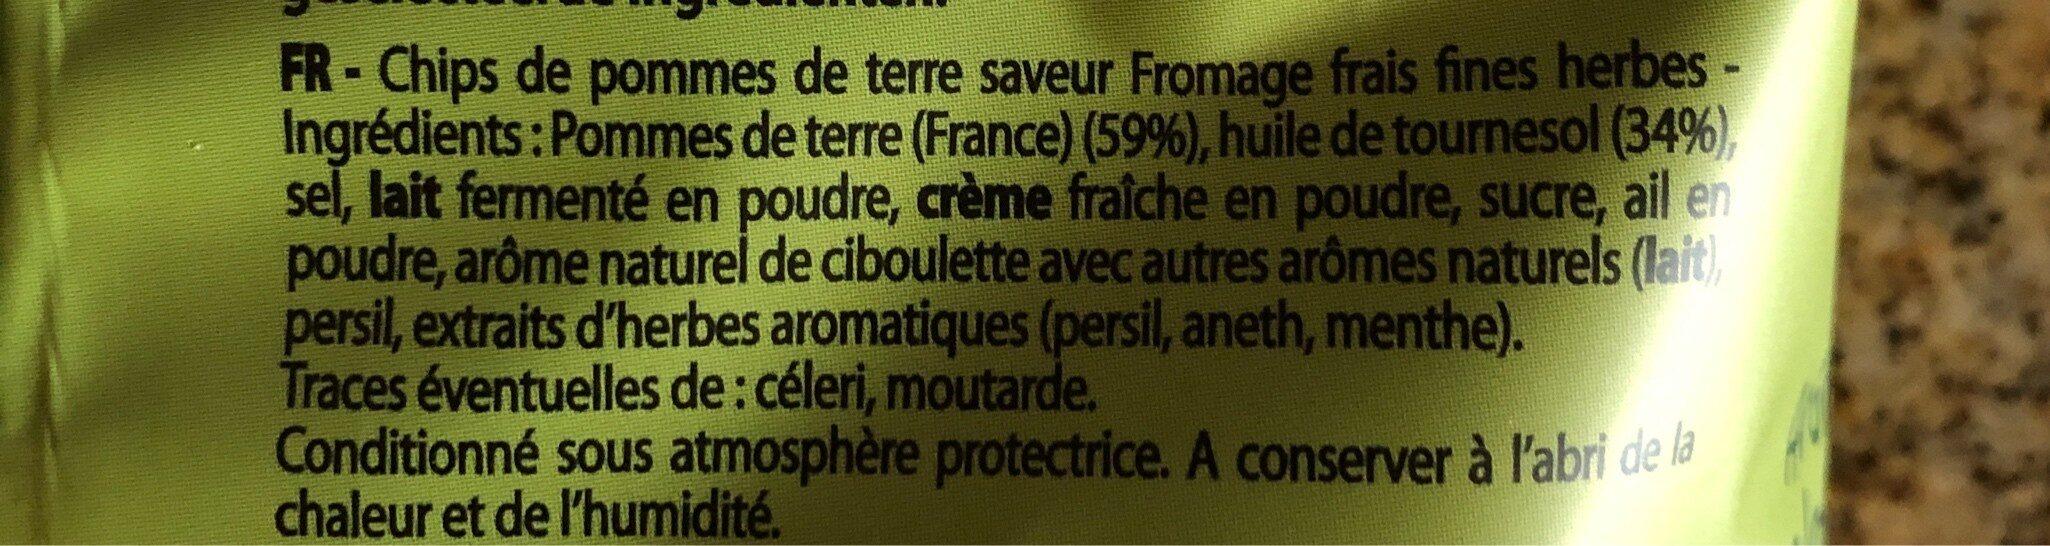 Chips saveur fromage frais aux fines herbes - Ingrediënten